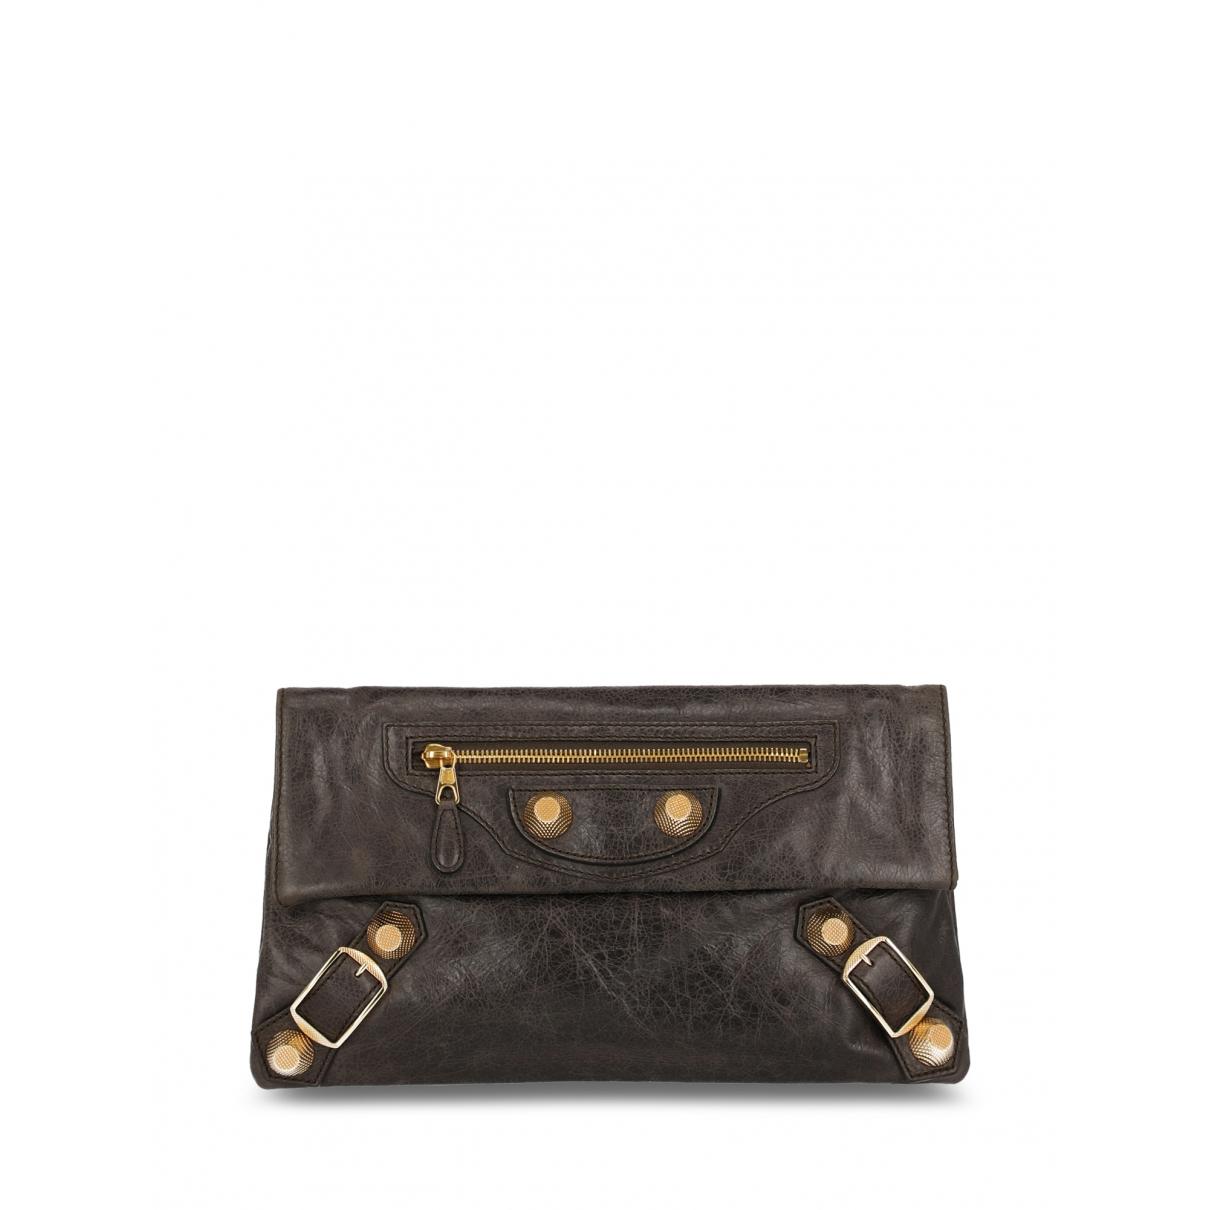 Balenciaga - Pochette Envelop pour femme en cuir - marron